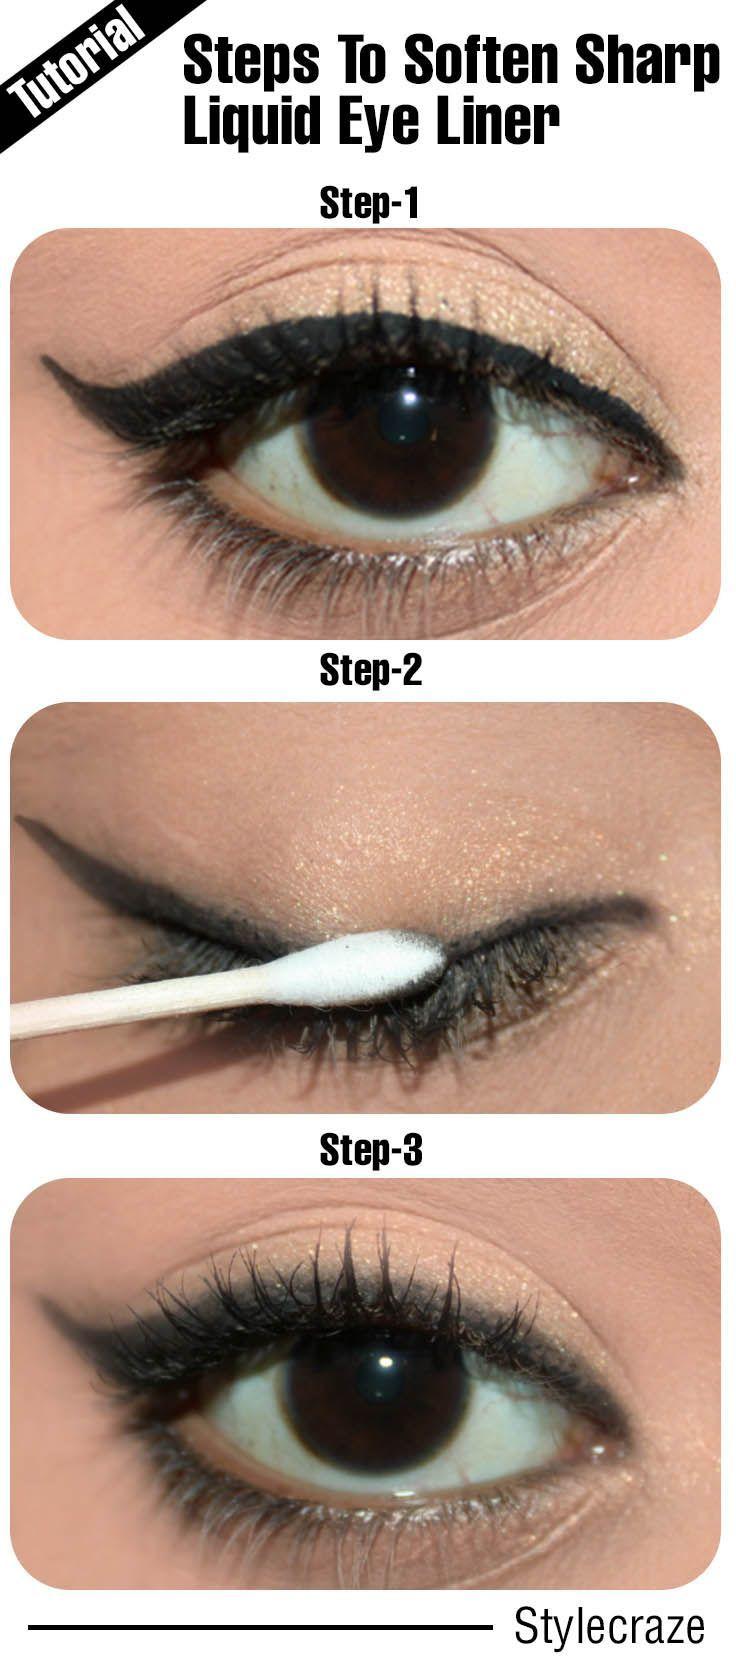 #Eyeliner stay longer #eyeliner lasts all day #stop eyeliner smudging #smudge proof eyeliner #eyeliner tutorial #eyeliner application